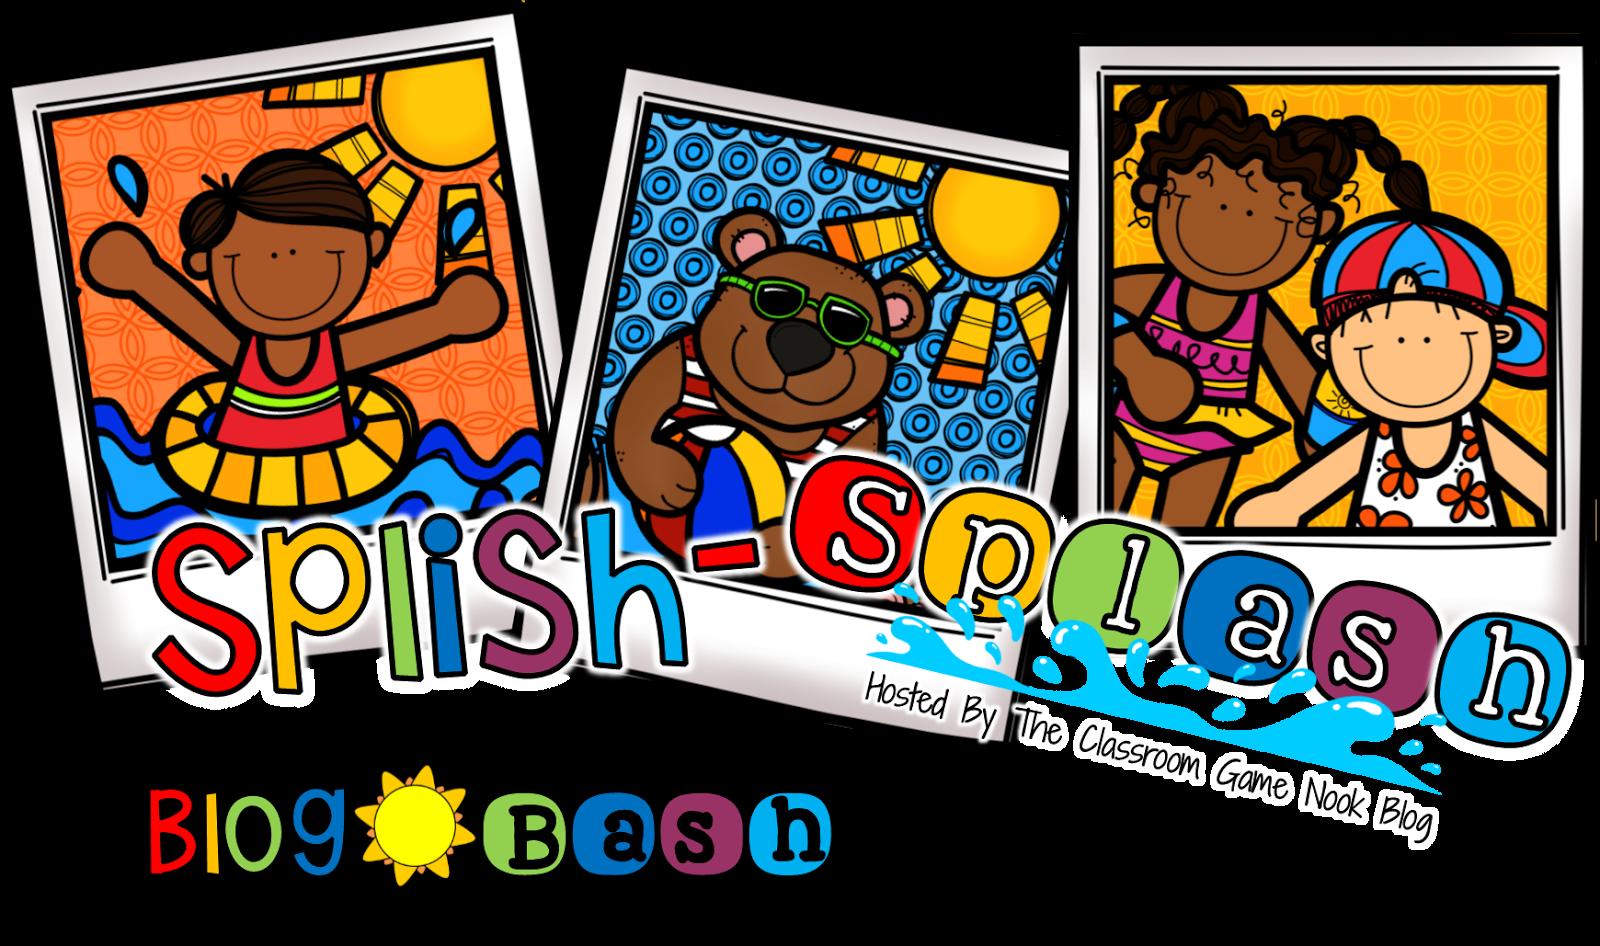 Back to school bash clipart jpg freeuse stock Forever in Fifth Grade: Splish Splash It's a Summer Time Blog Bash! jpg freeuse stock